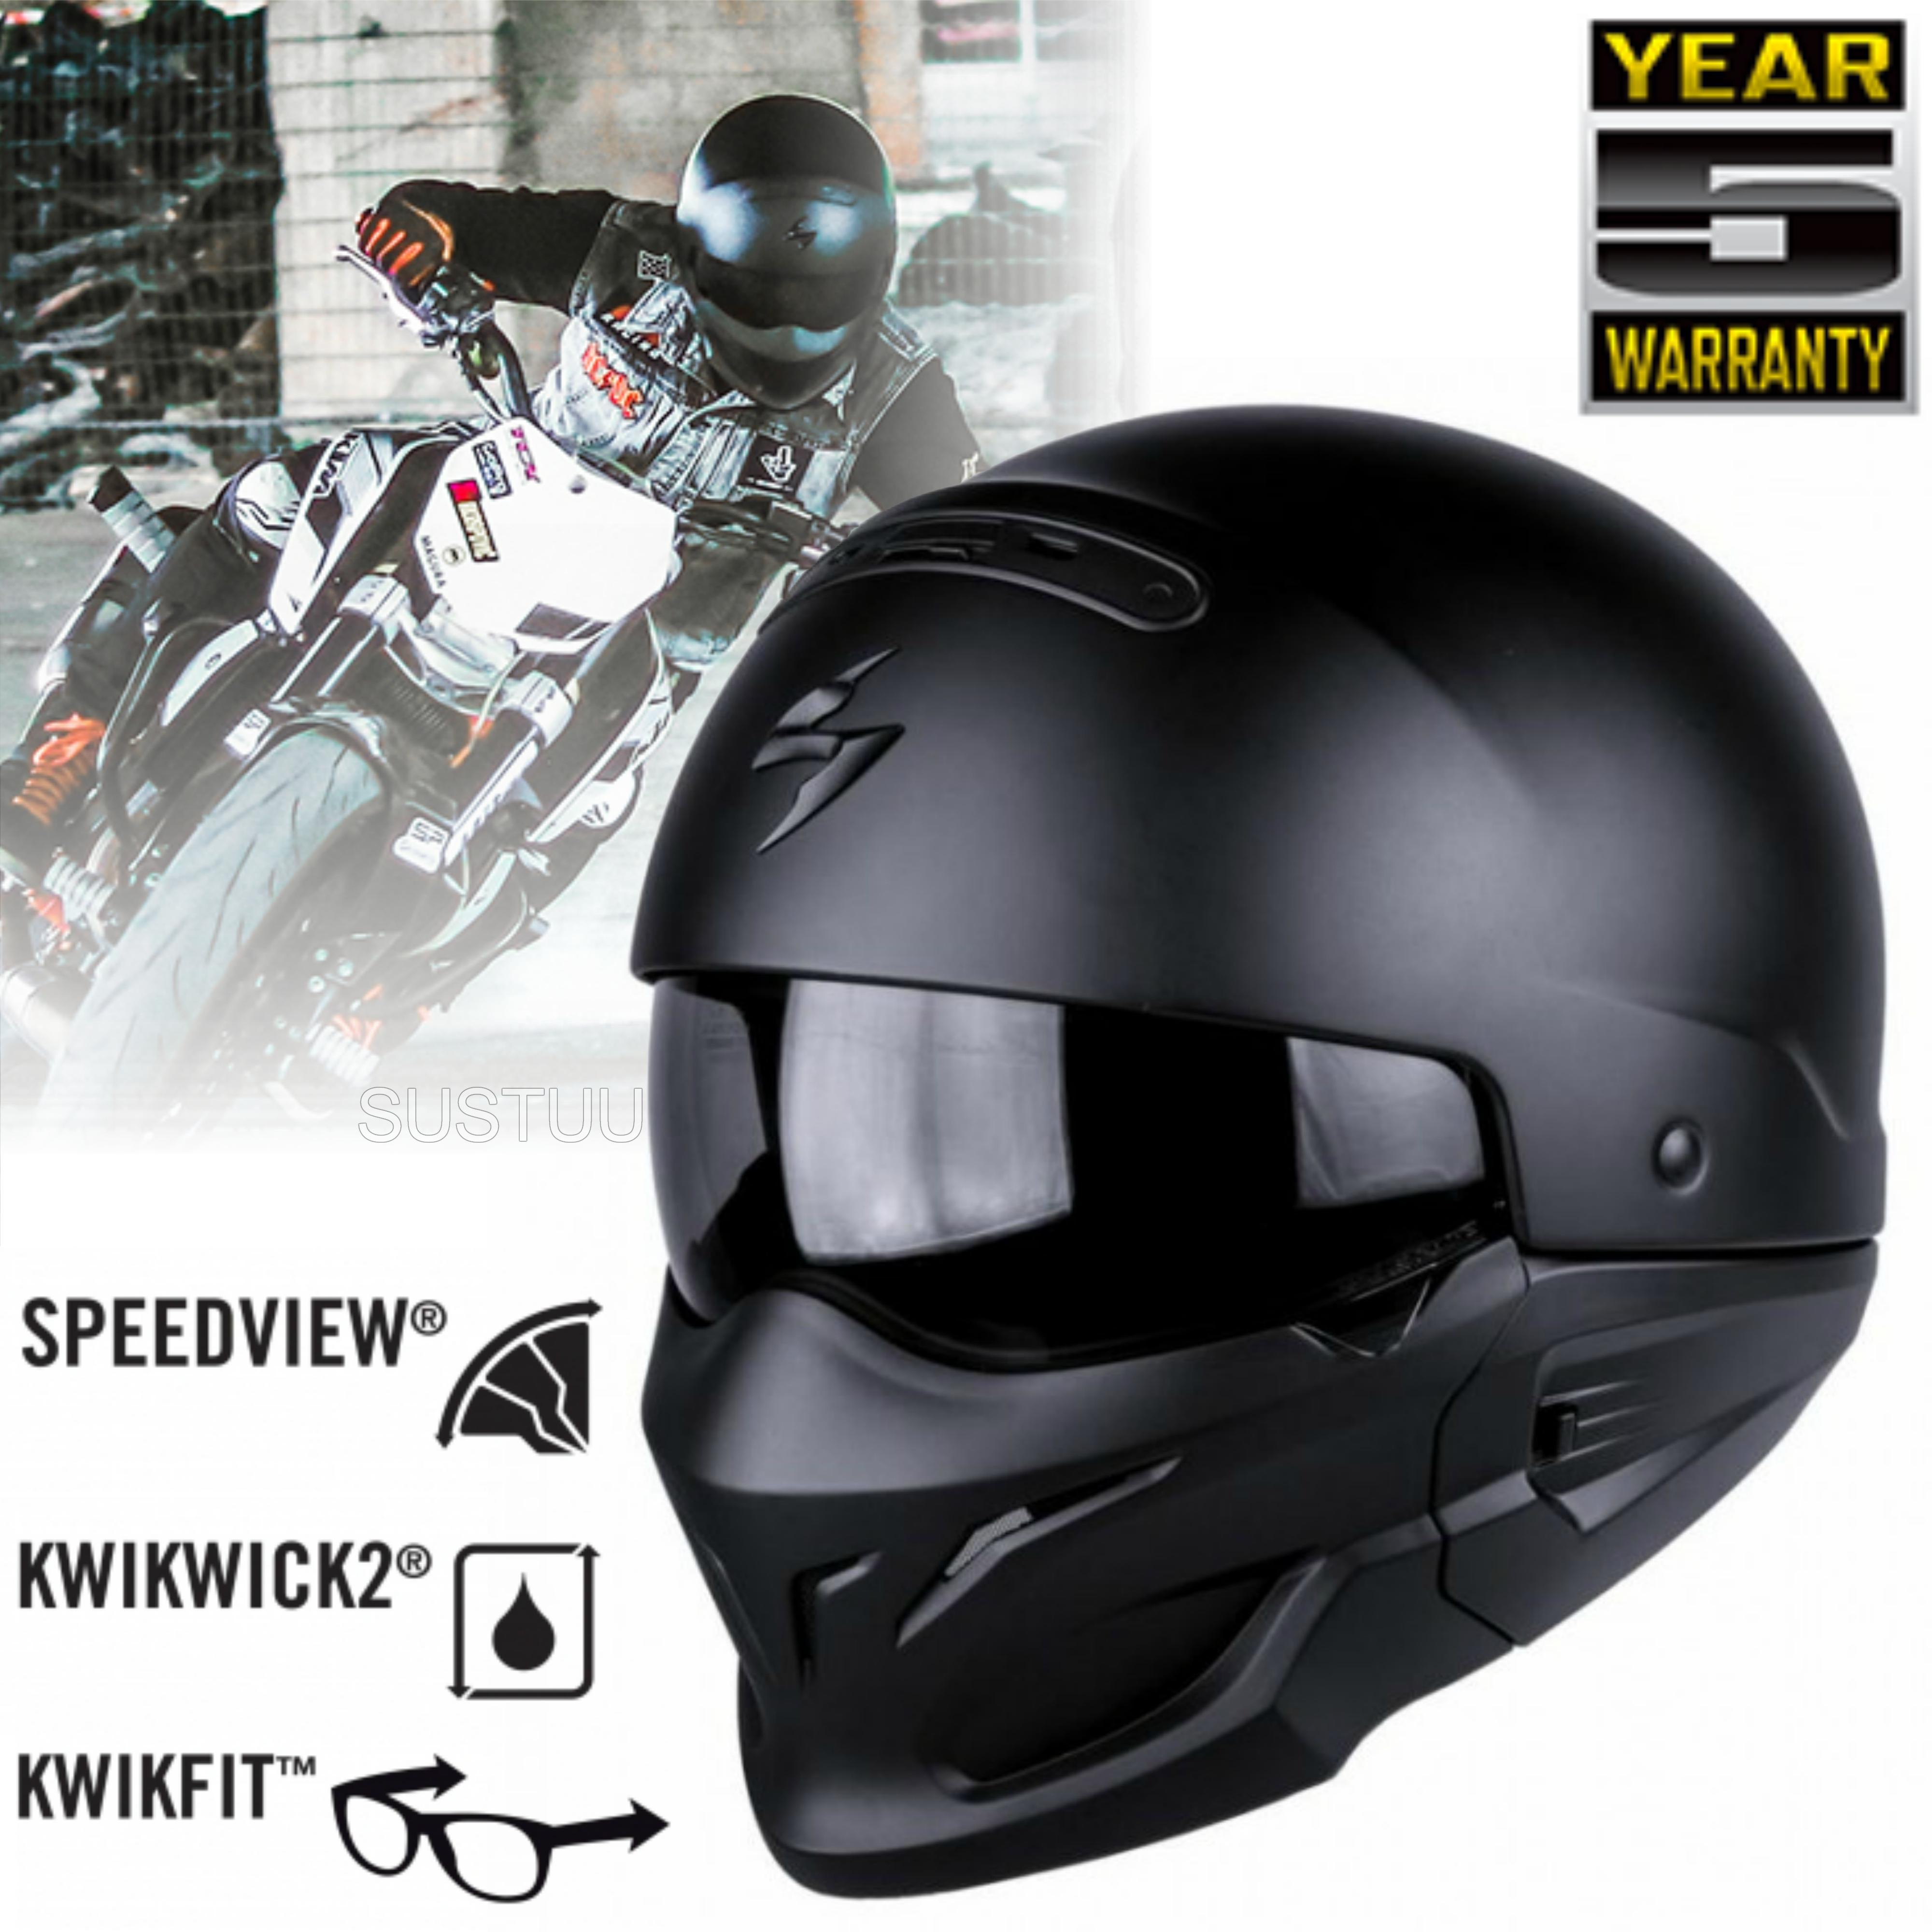 Scorpion Exo Combat Open Face Motorcycle Unisex Helmet|Crossover|Jet Style|Matt Black